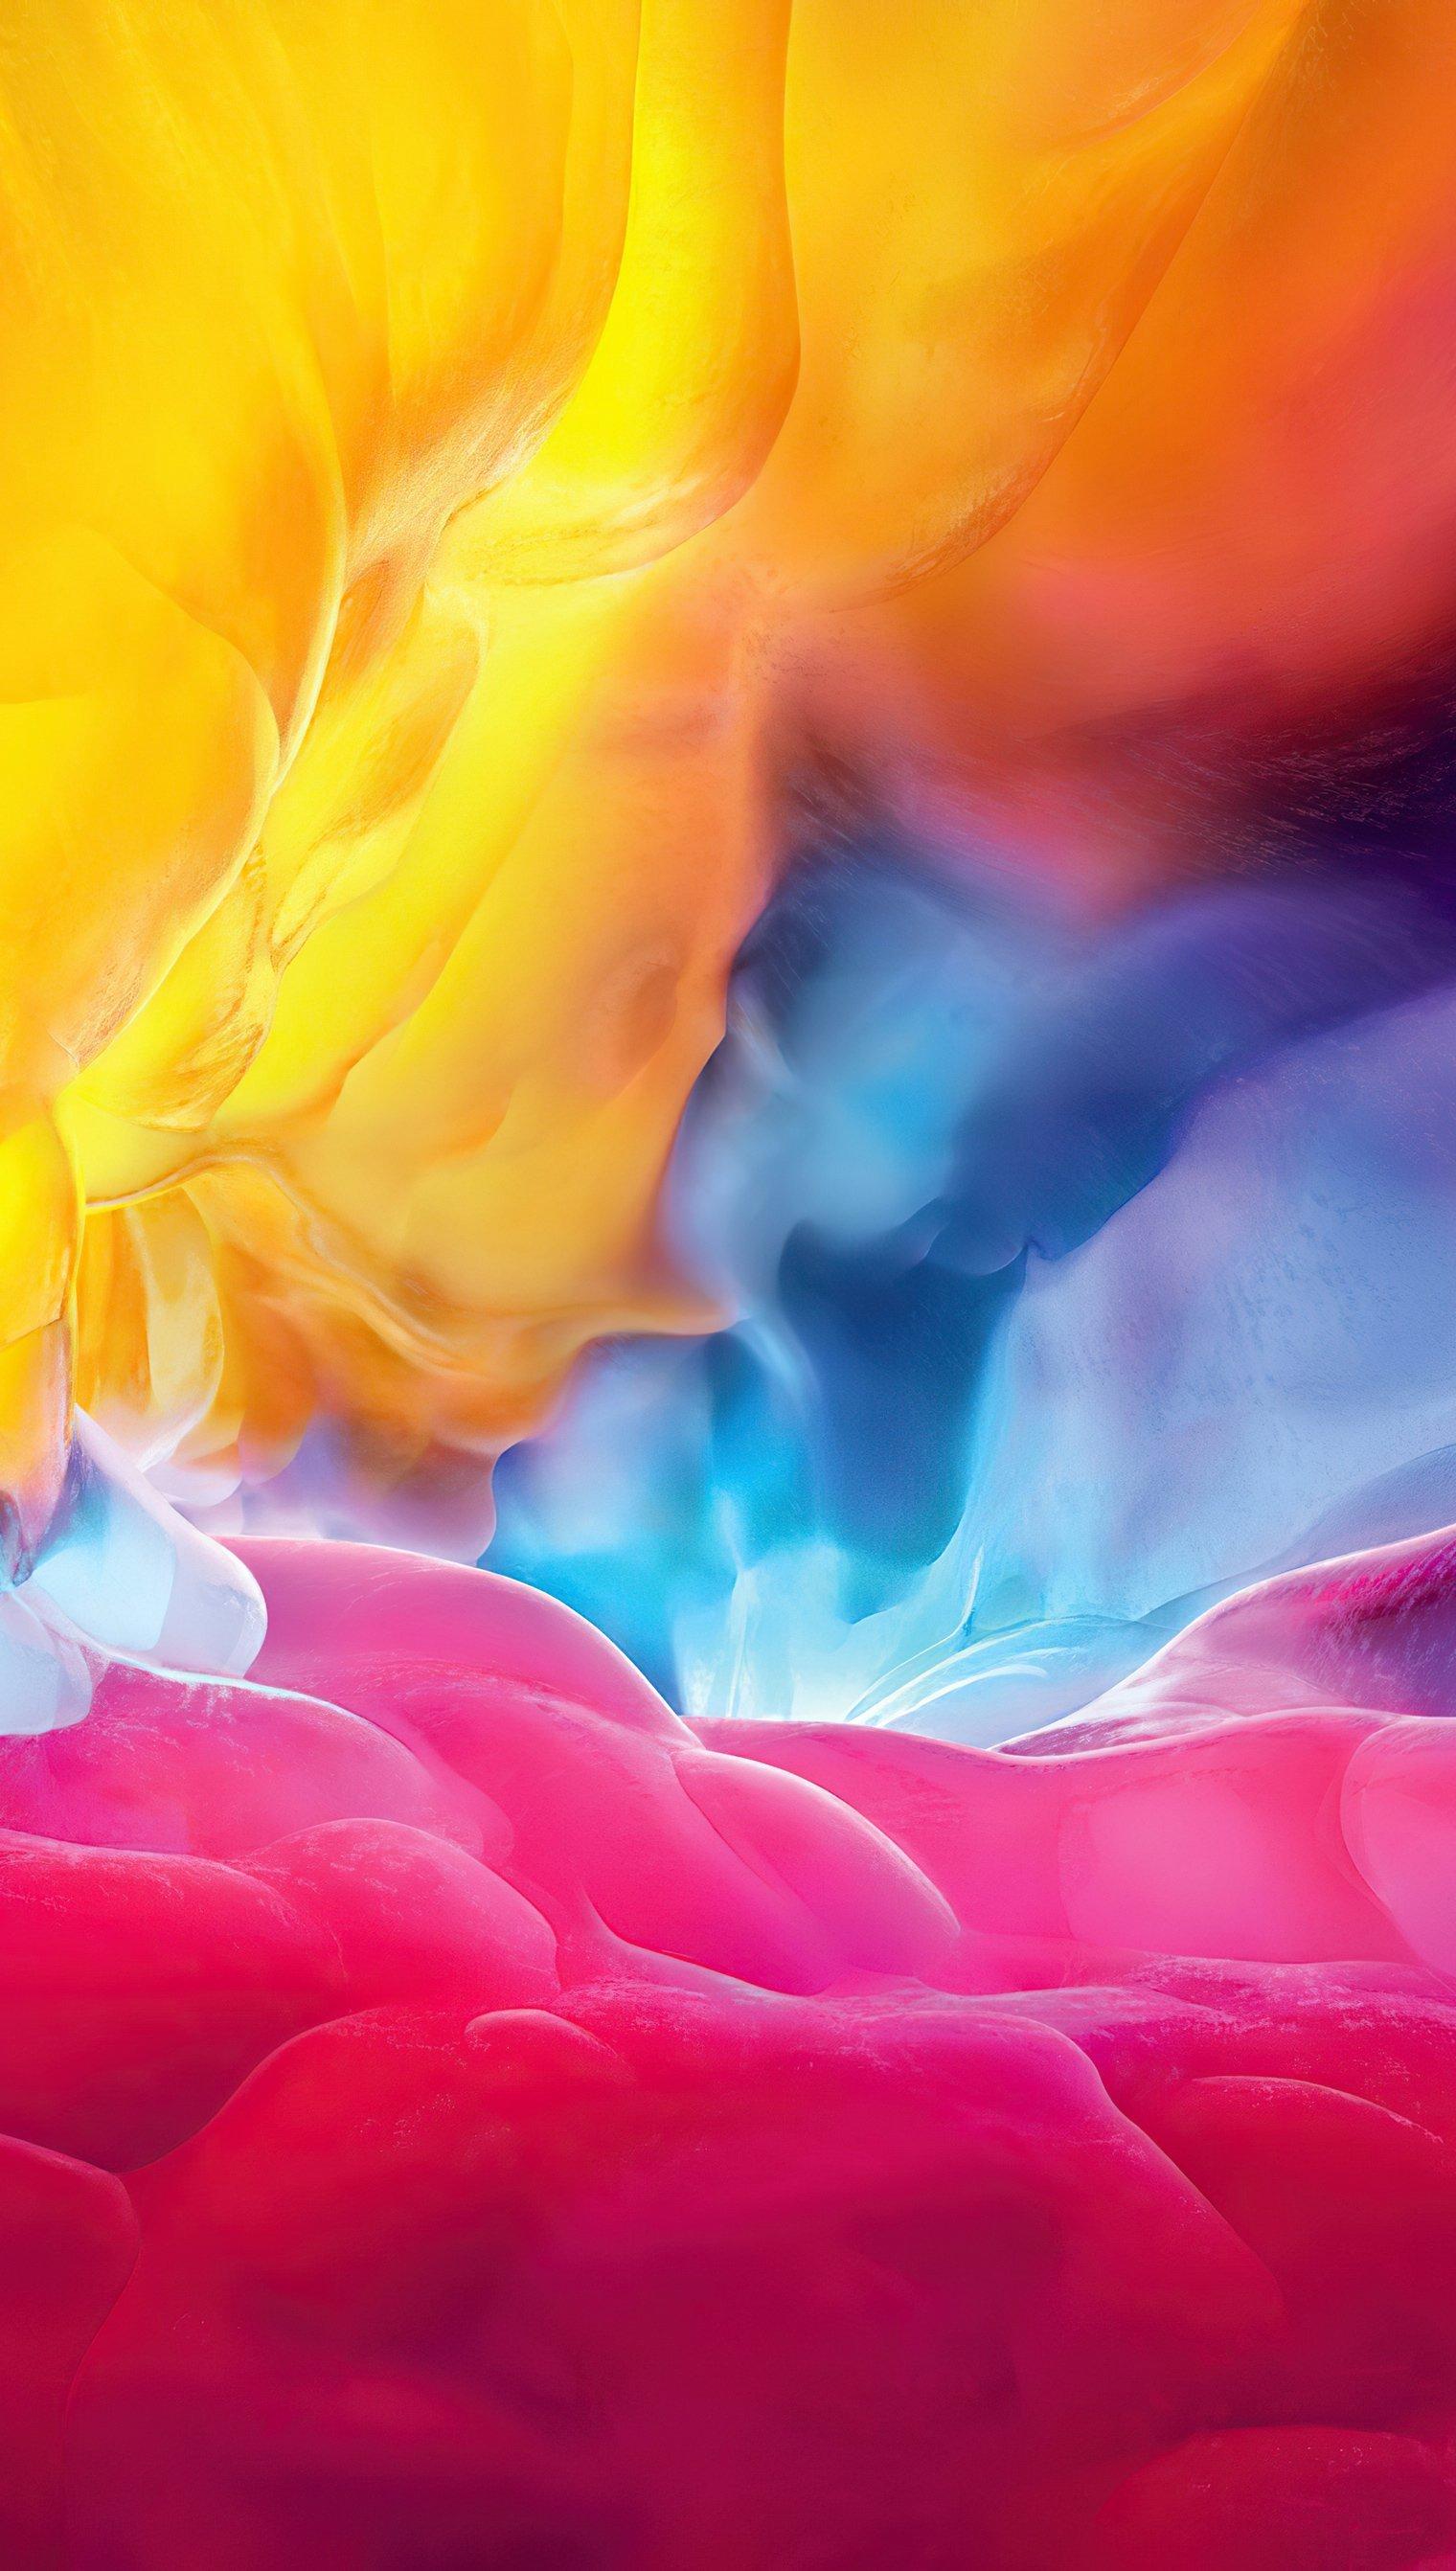 Fondos de pantalla Explosión de colores Vertical